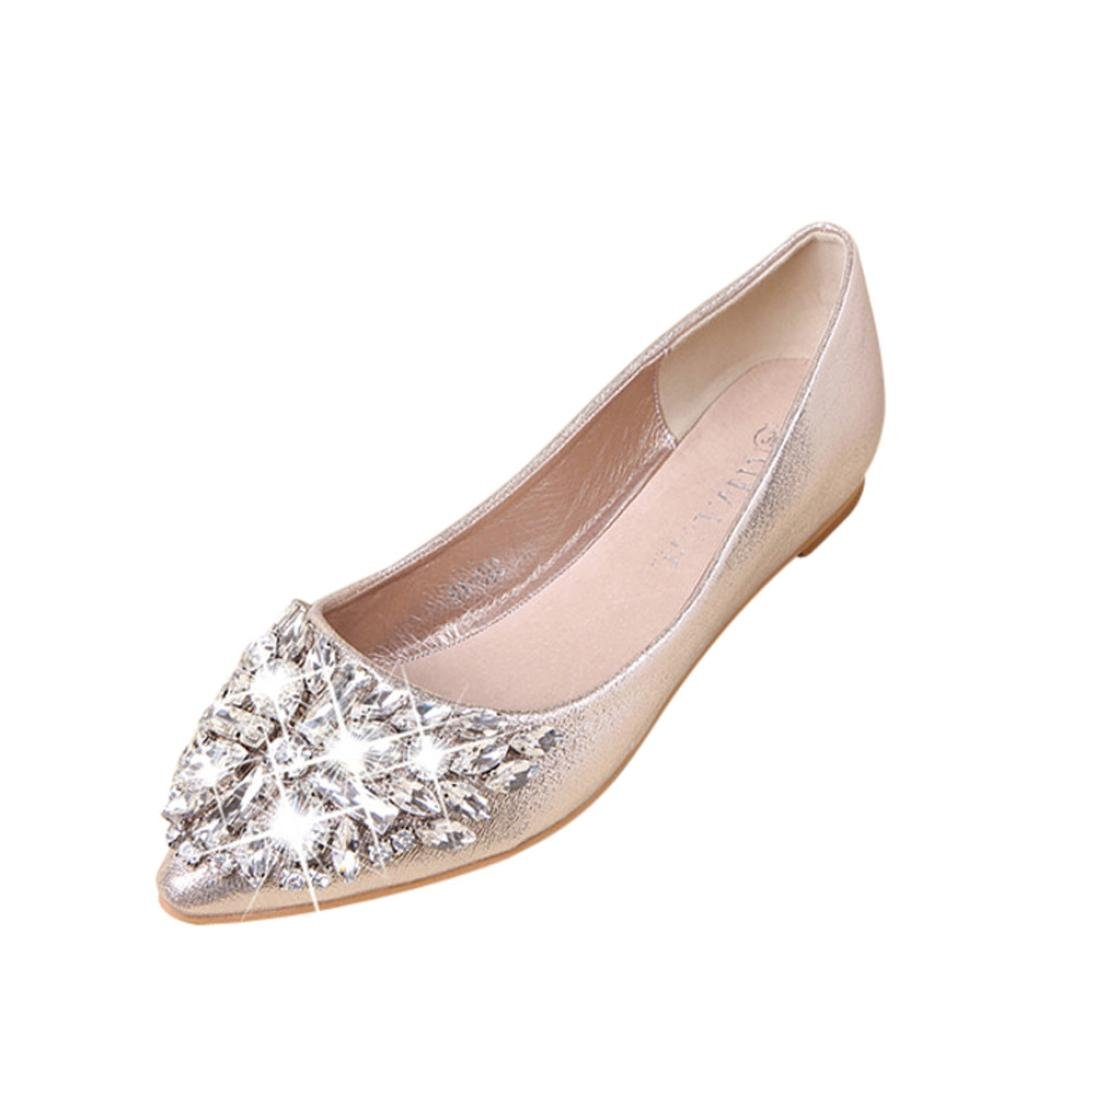 b517b1daca53 Amazon.com | Flat Shoes, AgrinTol Women's Casual Pointed Toe Rhinestone Low  Heel Flat Shoes | Shoes